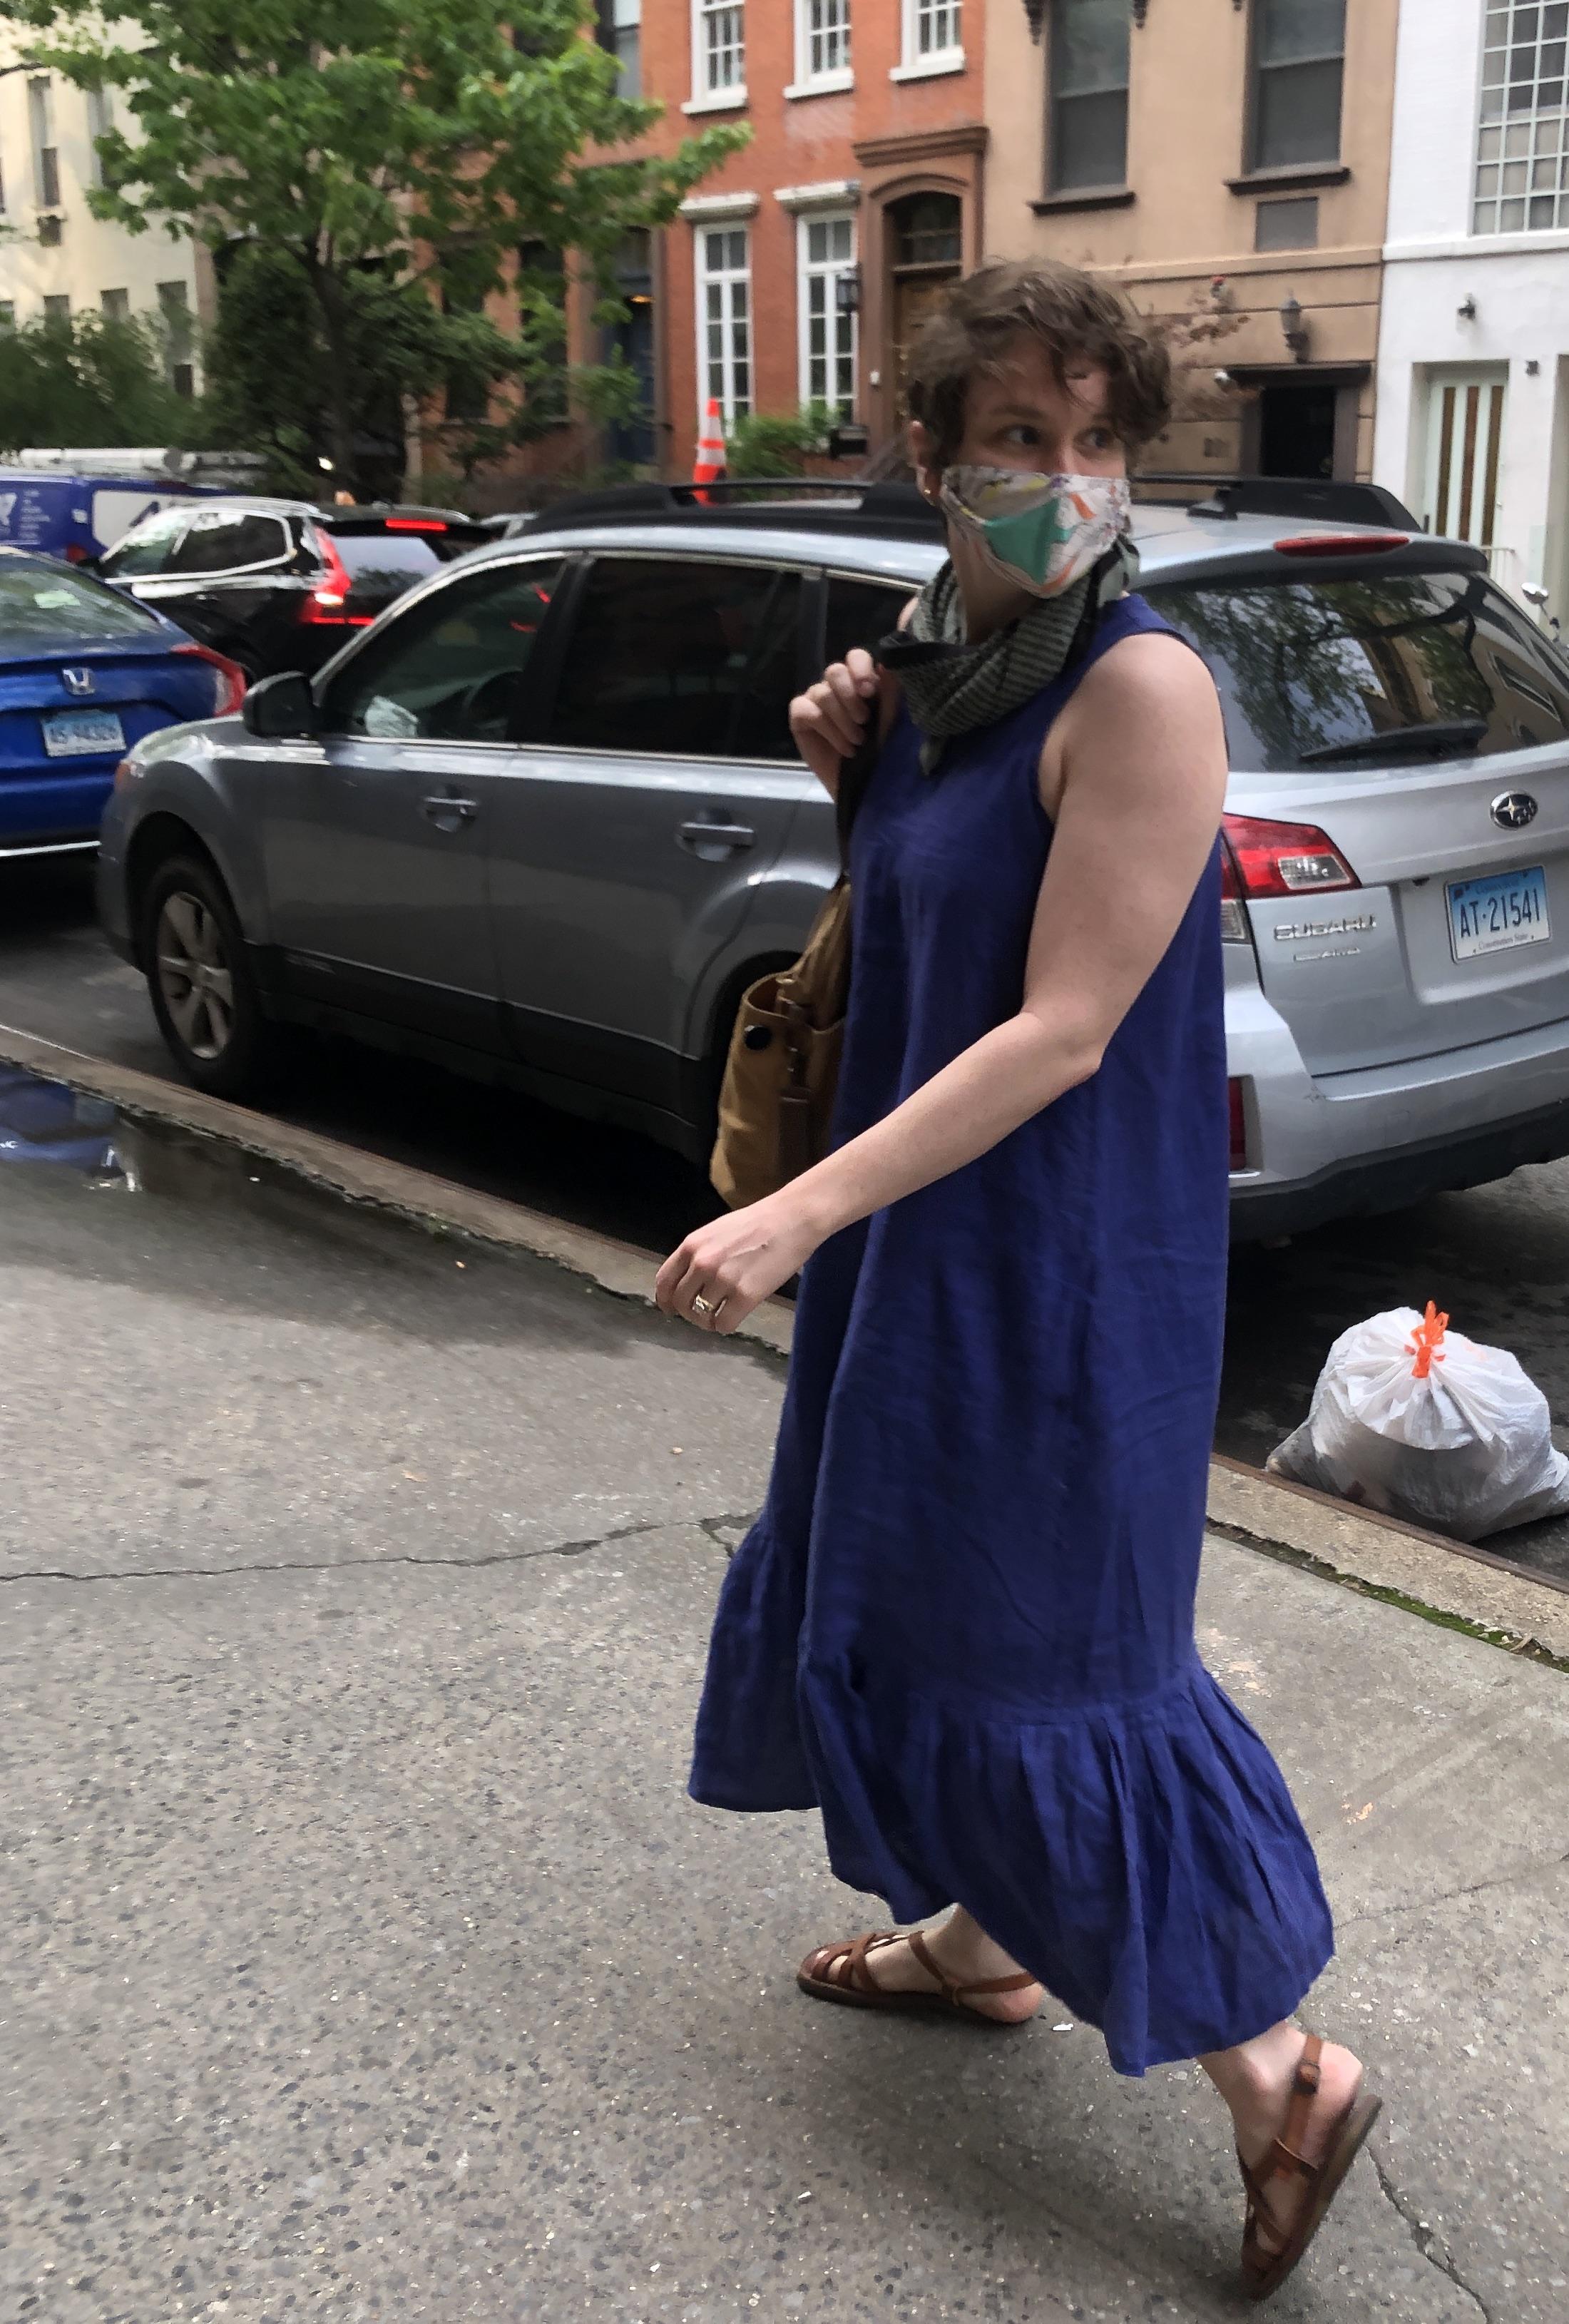 a woman walking in a New York City street, wearing a homemade blue dress